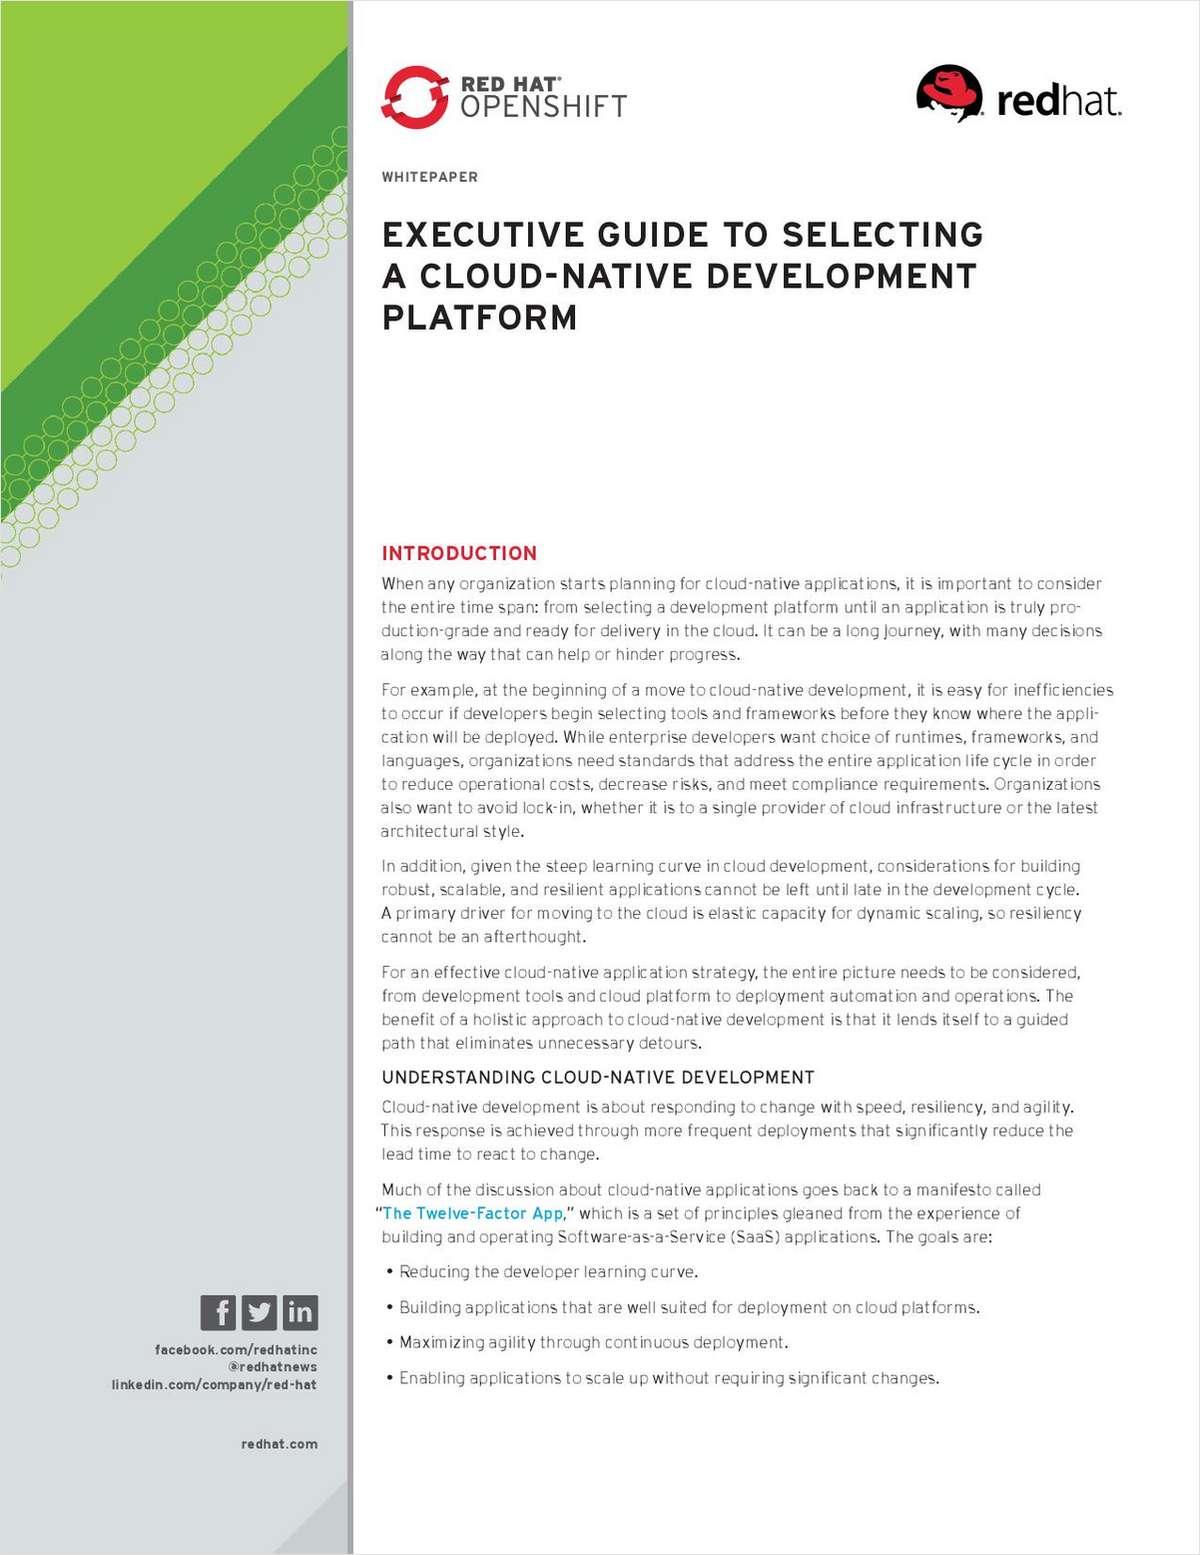 Executive Guide to Selecting a Cloud-Native Development Platform